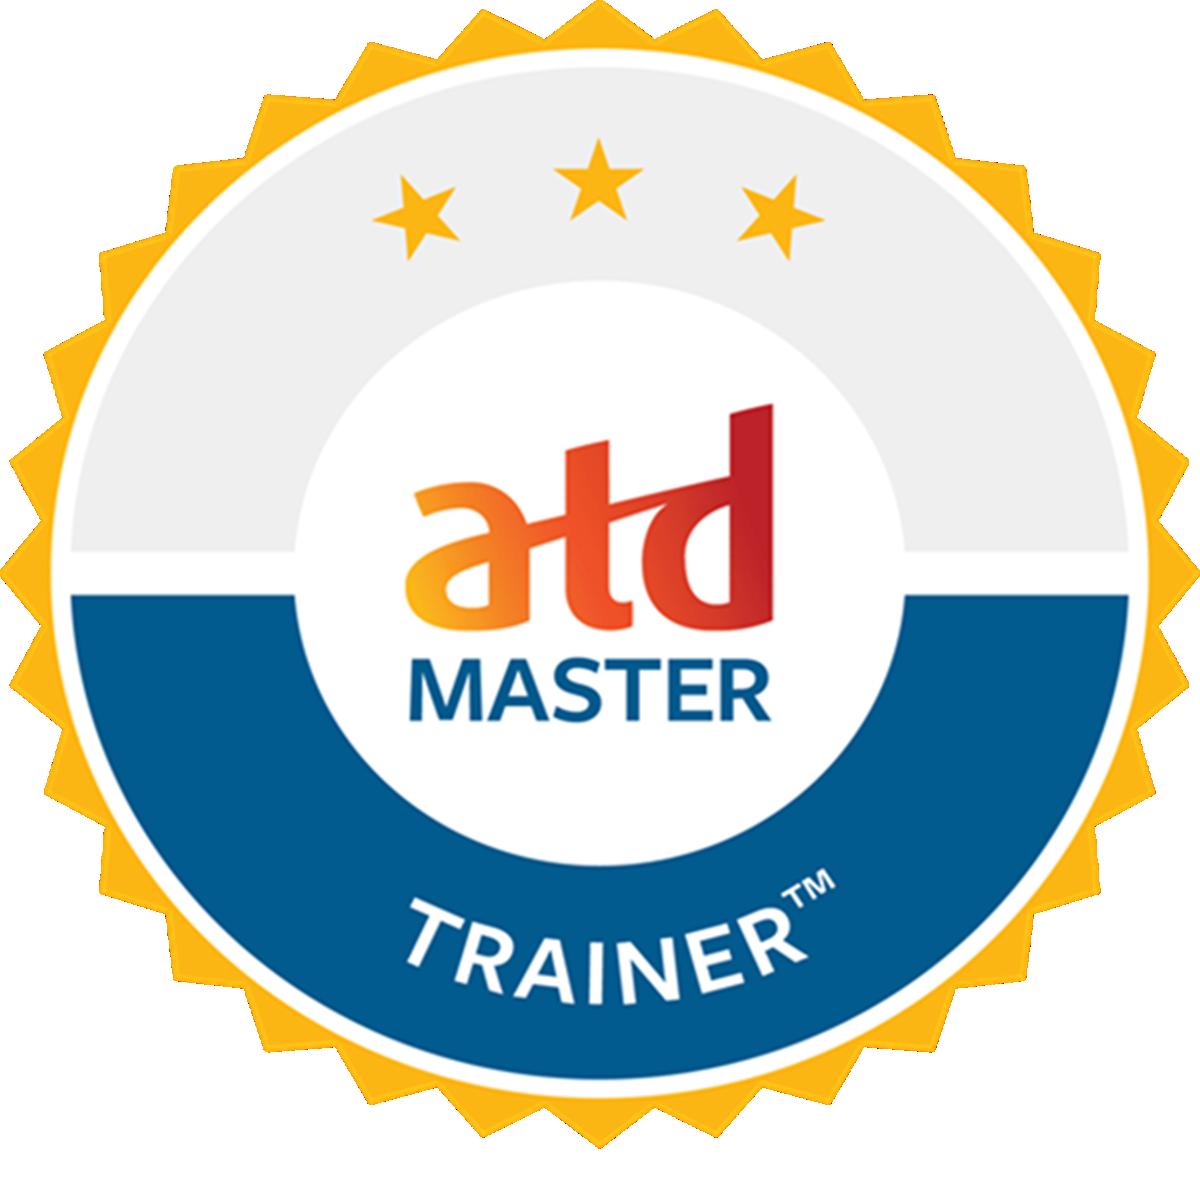 Association for Talent Development (ATD) Master Trainer™